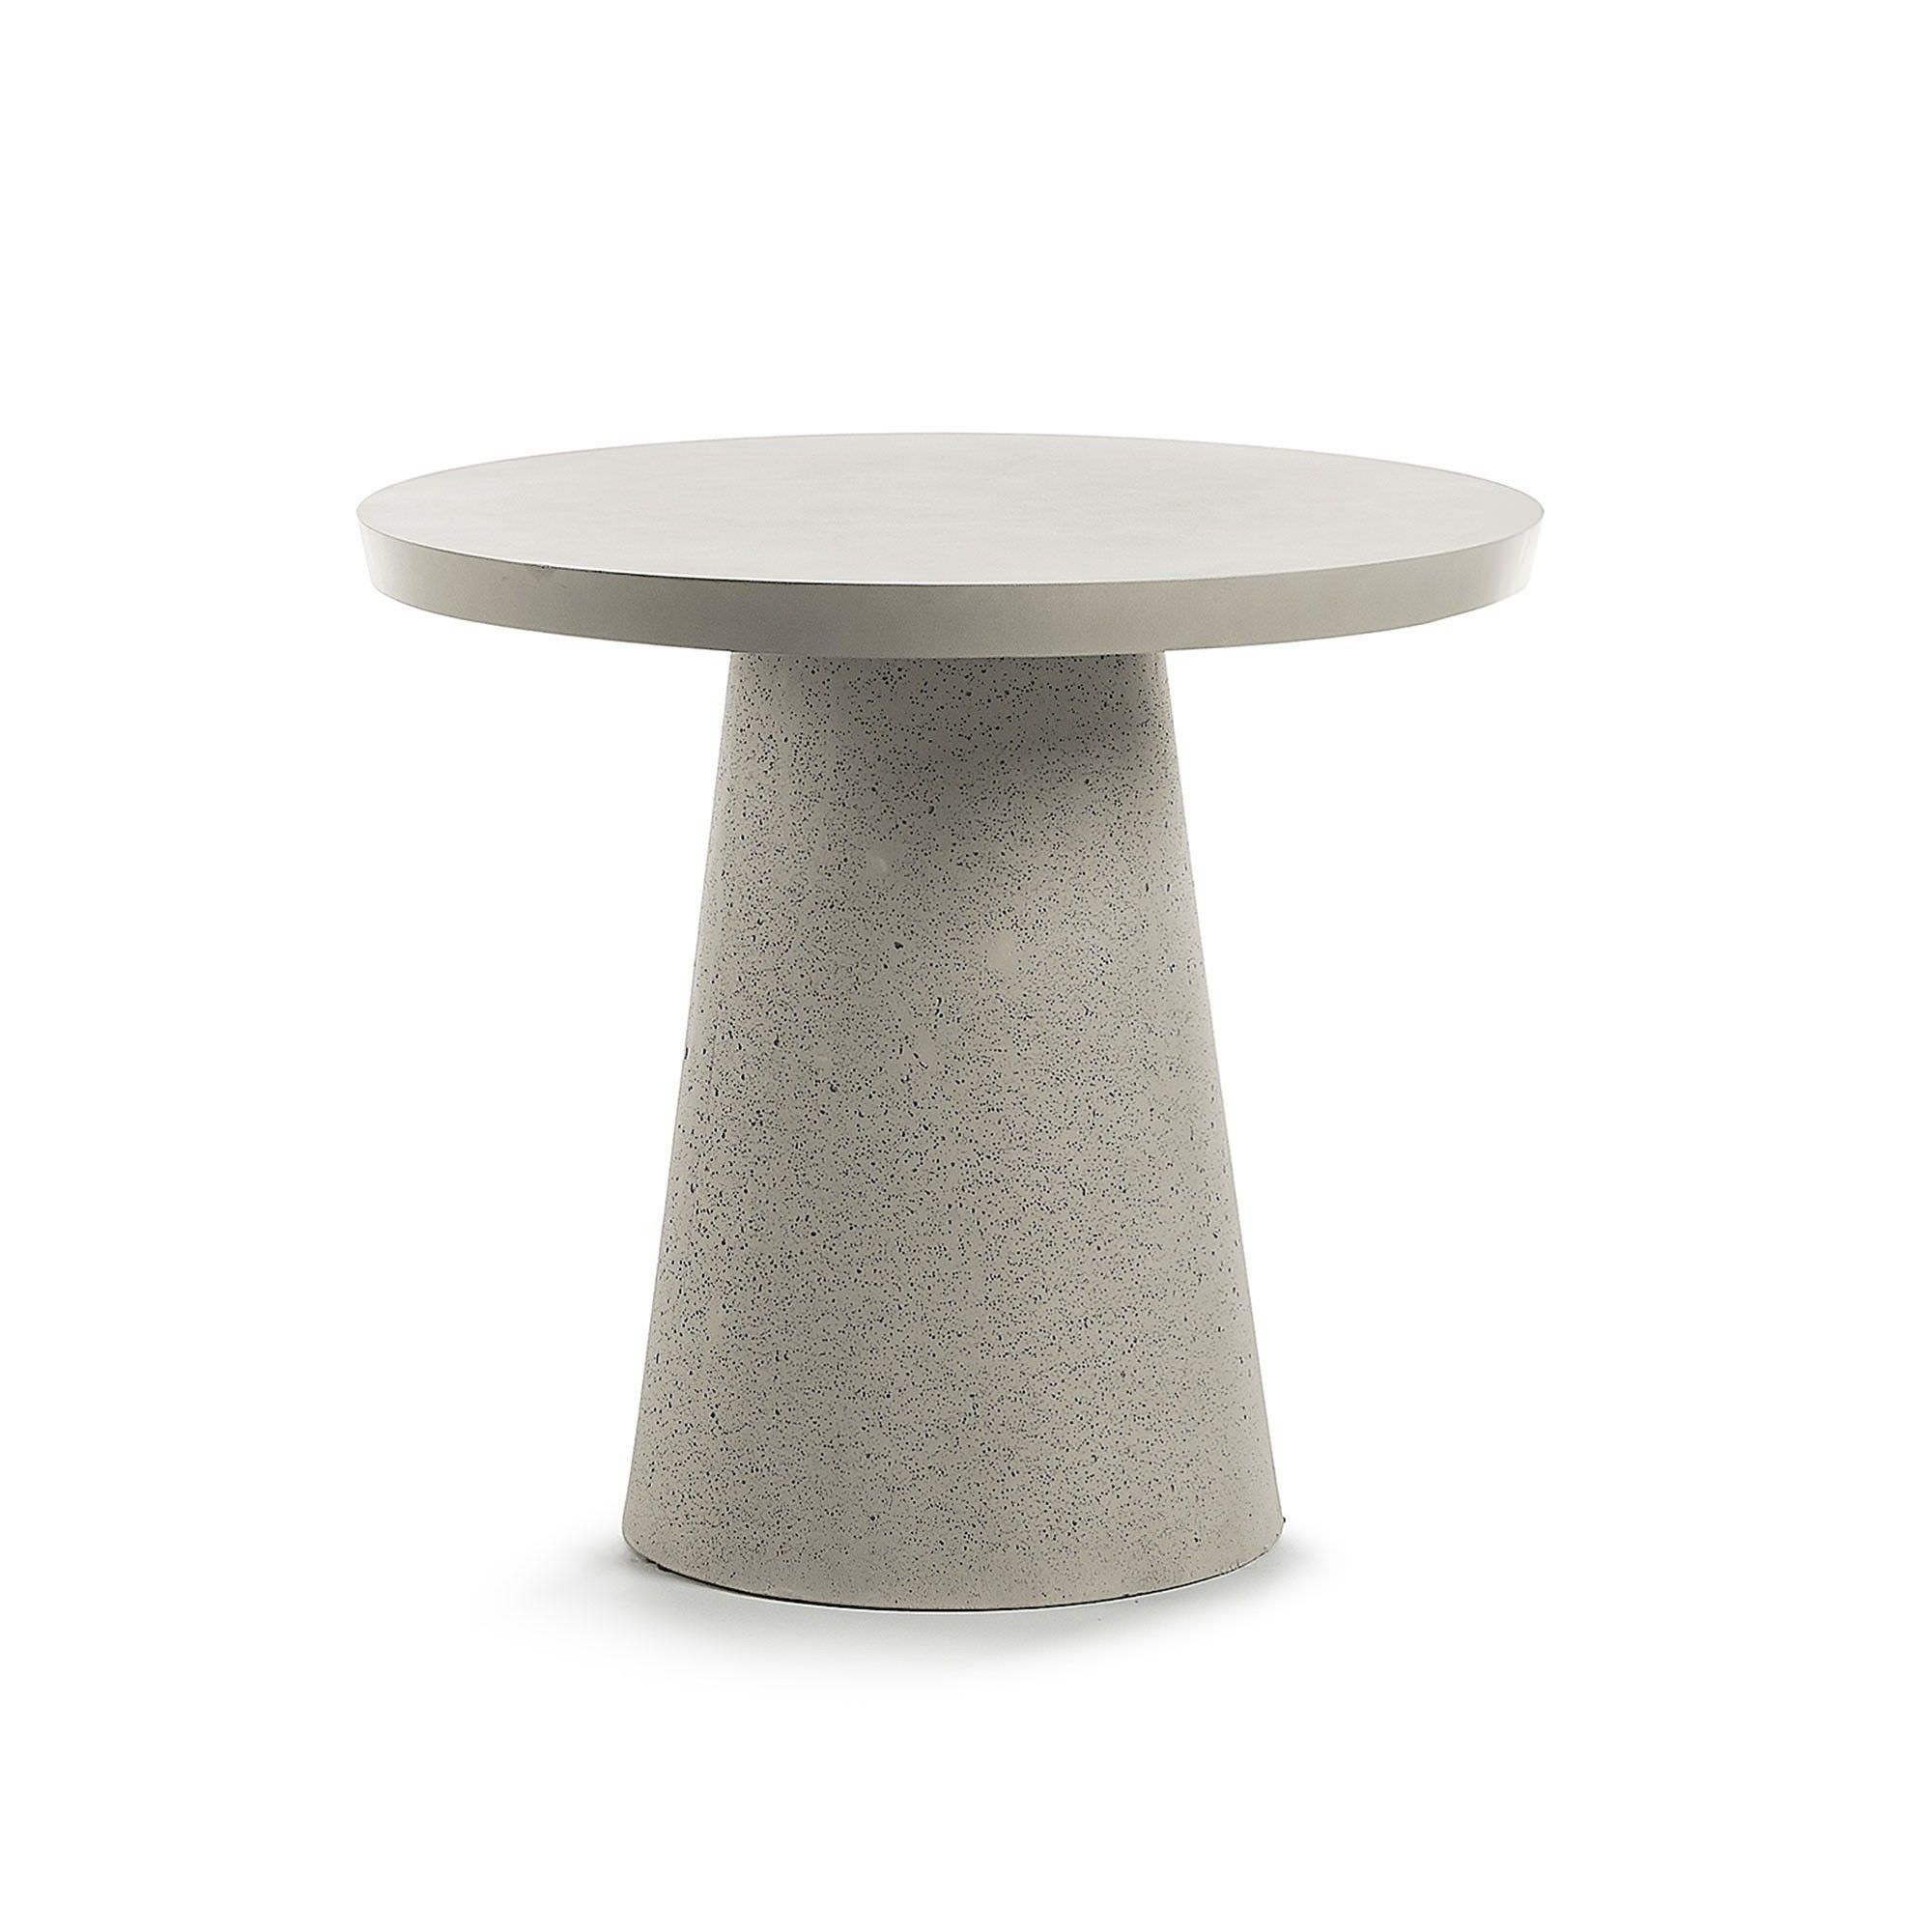 Roxbury Polycement Indoor / Outdoor Round Dining Table, 90cm